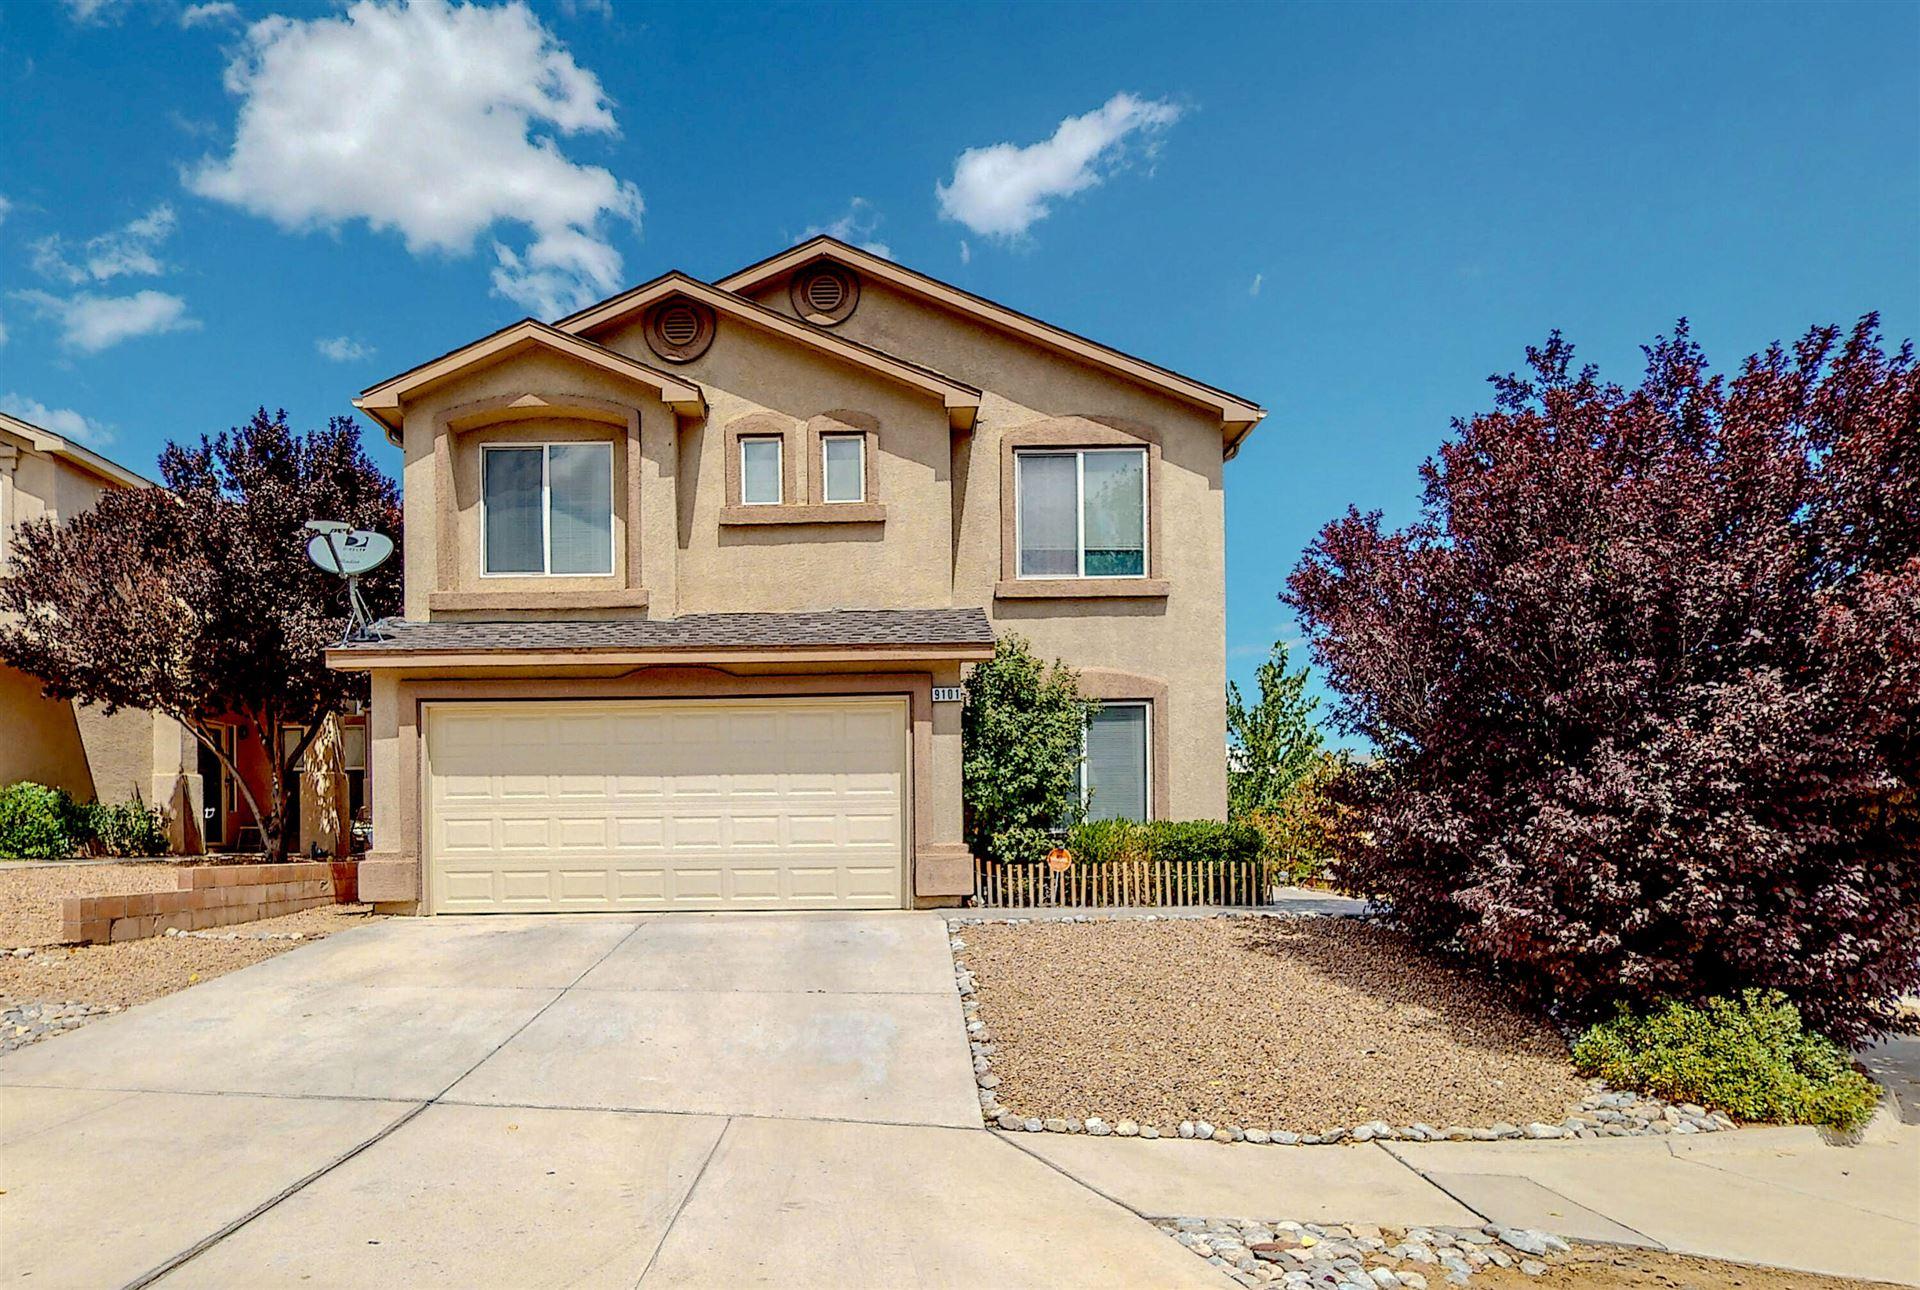 9101 LOWER MEADOW Trail SW, Albuquerque, NM 87121 - #: 999555